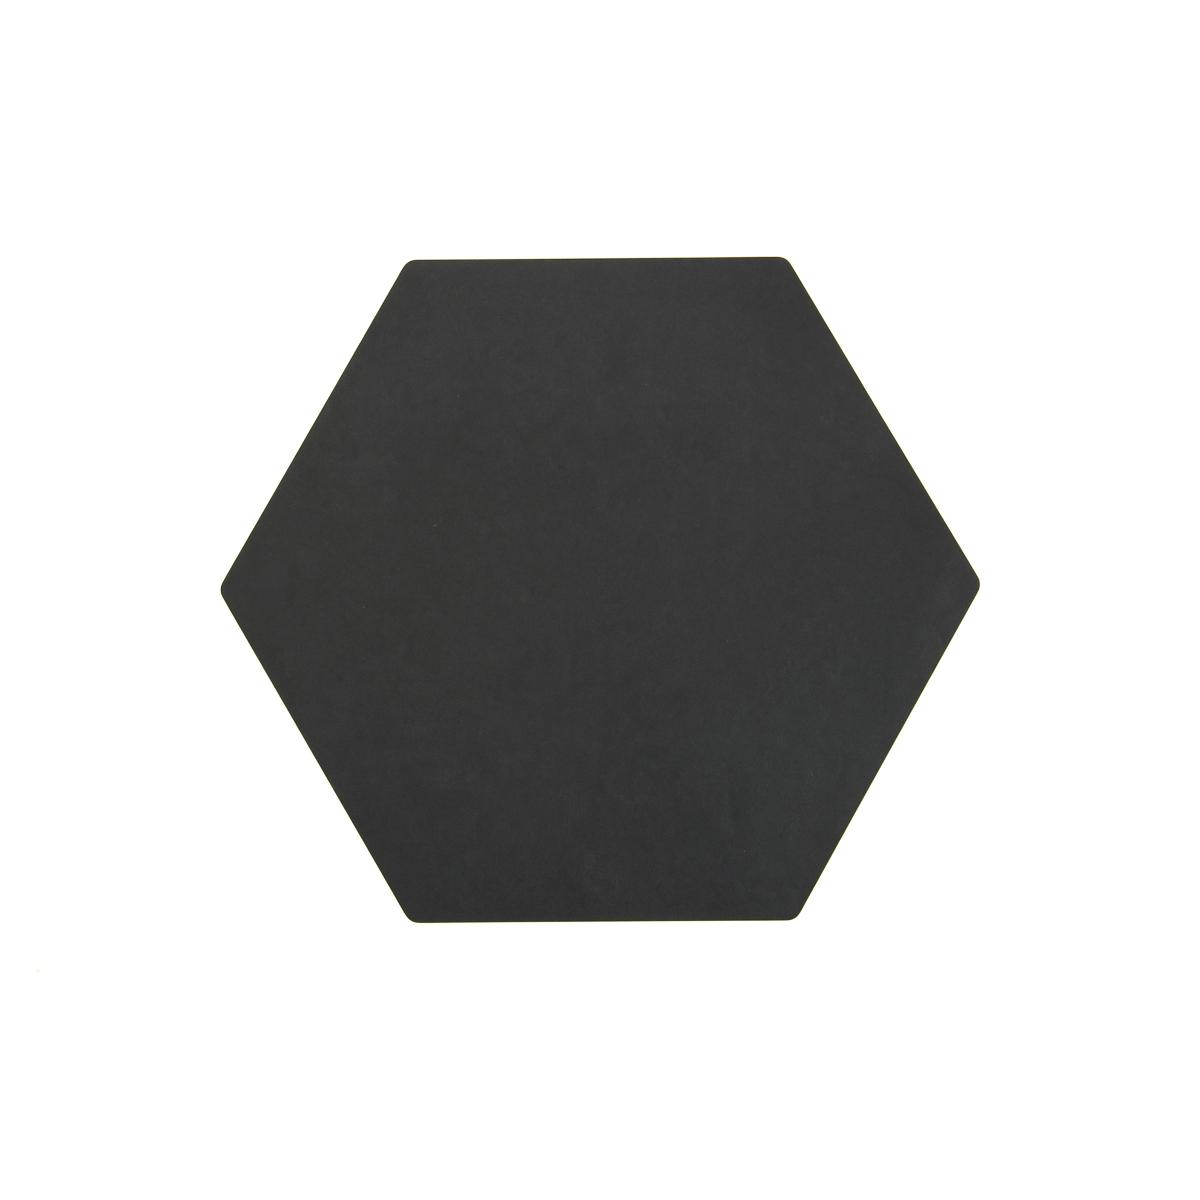 Epicurean Hexagon Series Slate 13 Inch Display Board